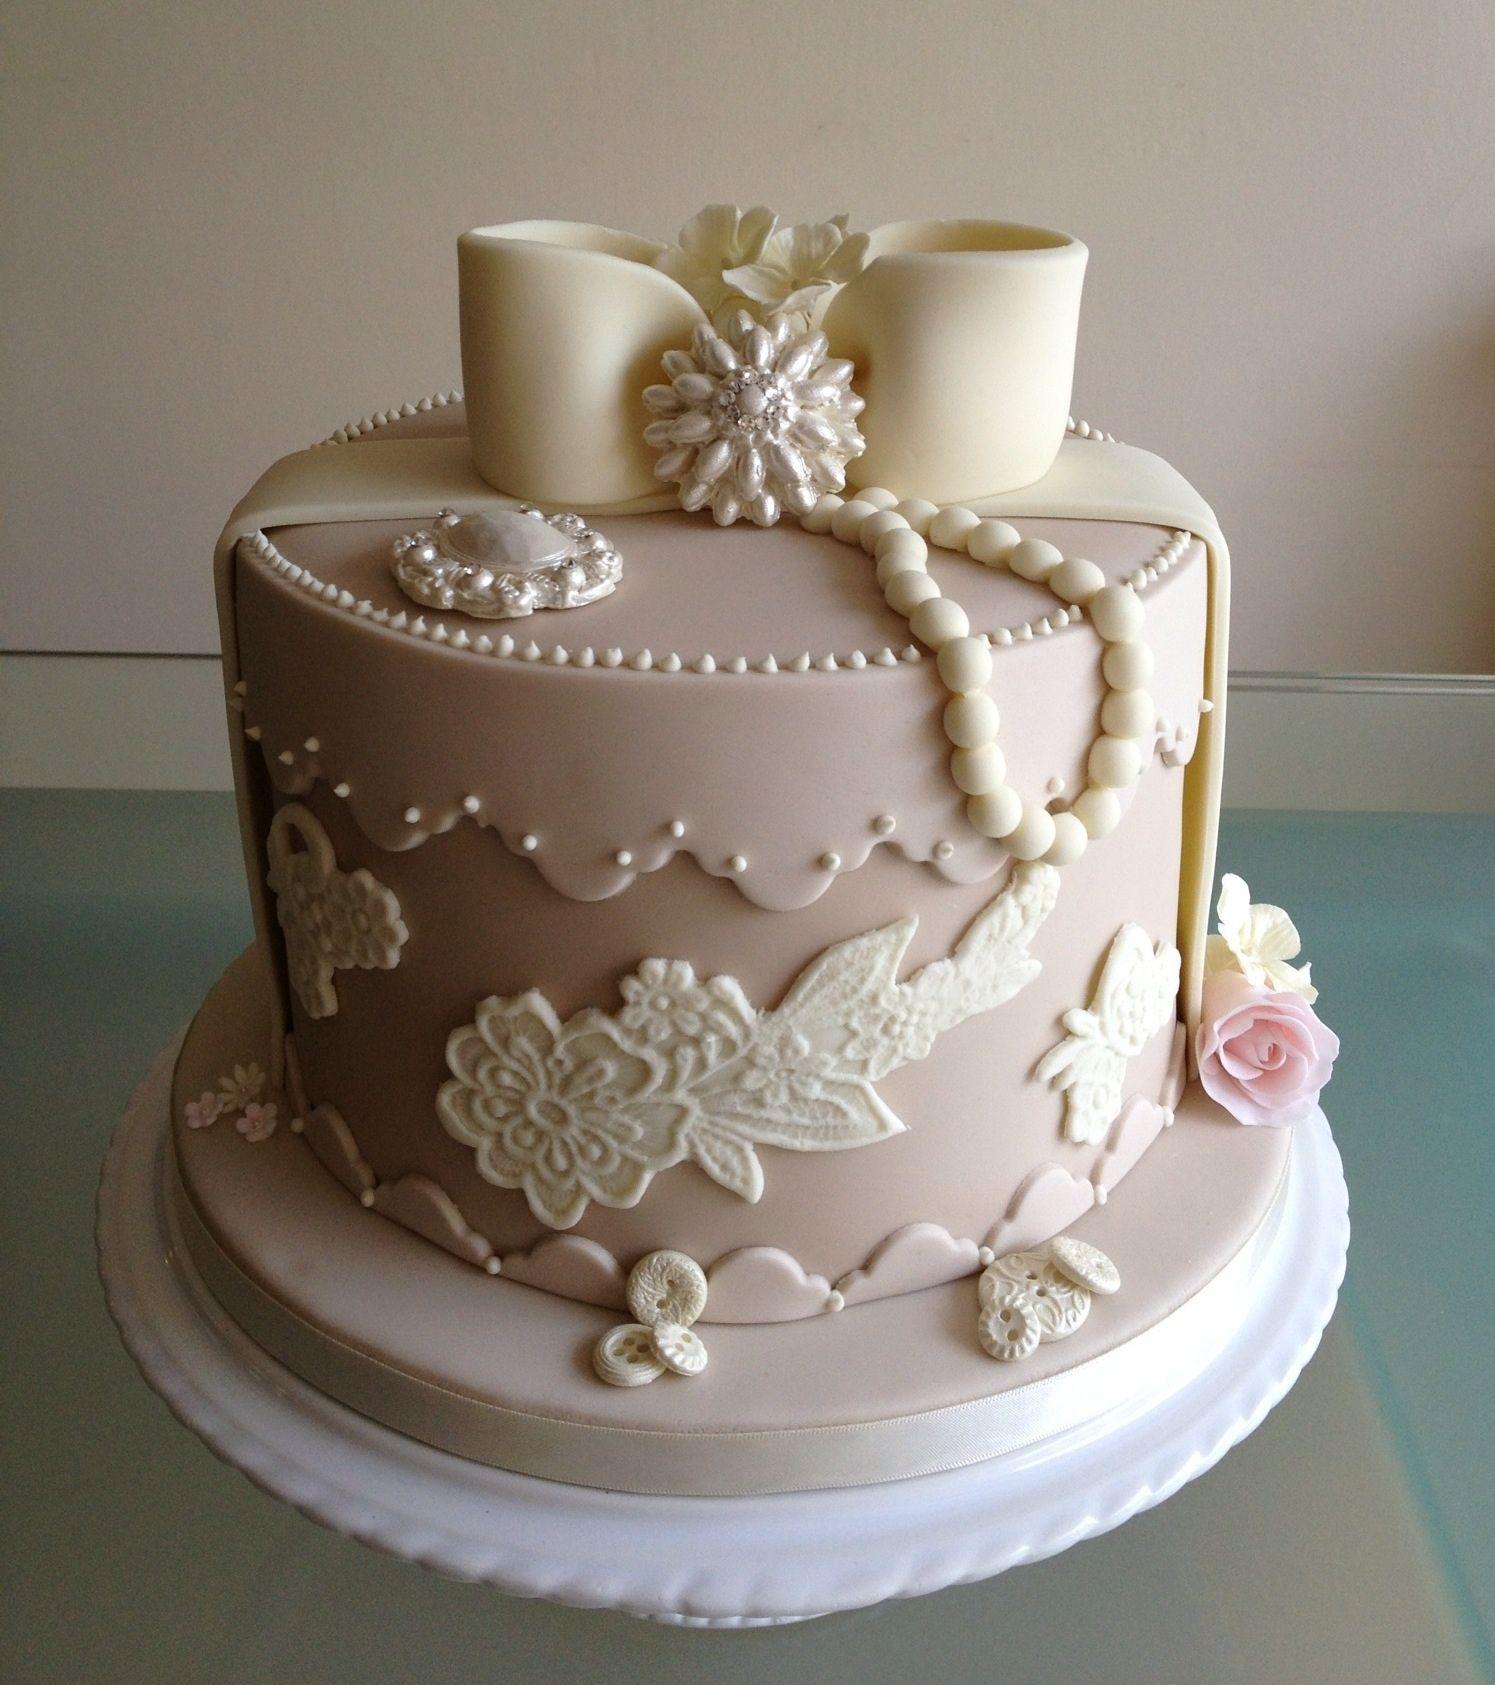 Groovy Vintage Cake Hat Inspiration Hat Box Cake Vintage Birthday Funny Birthday Cards Online Aboleapandamsfinfo